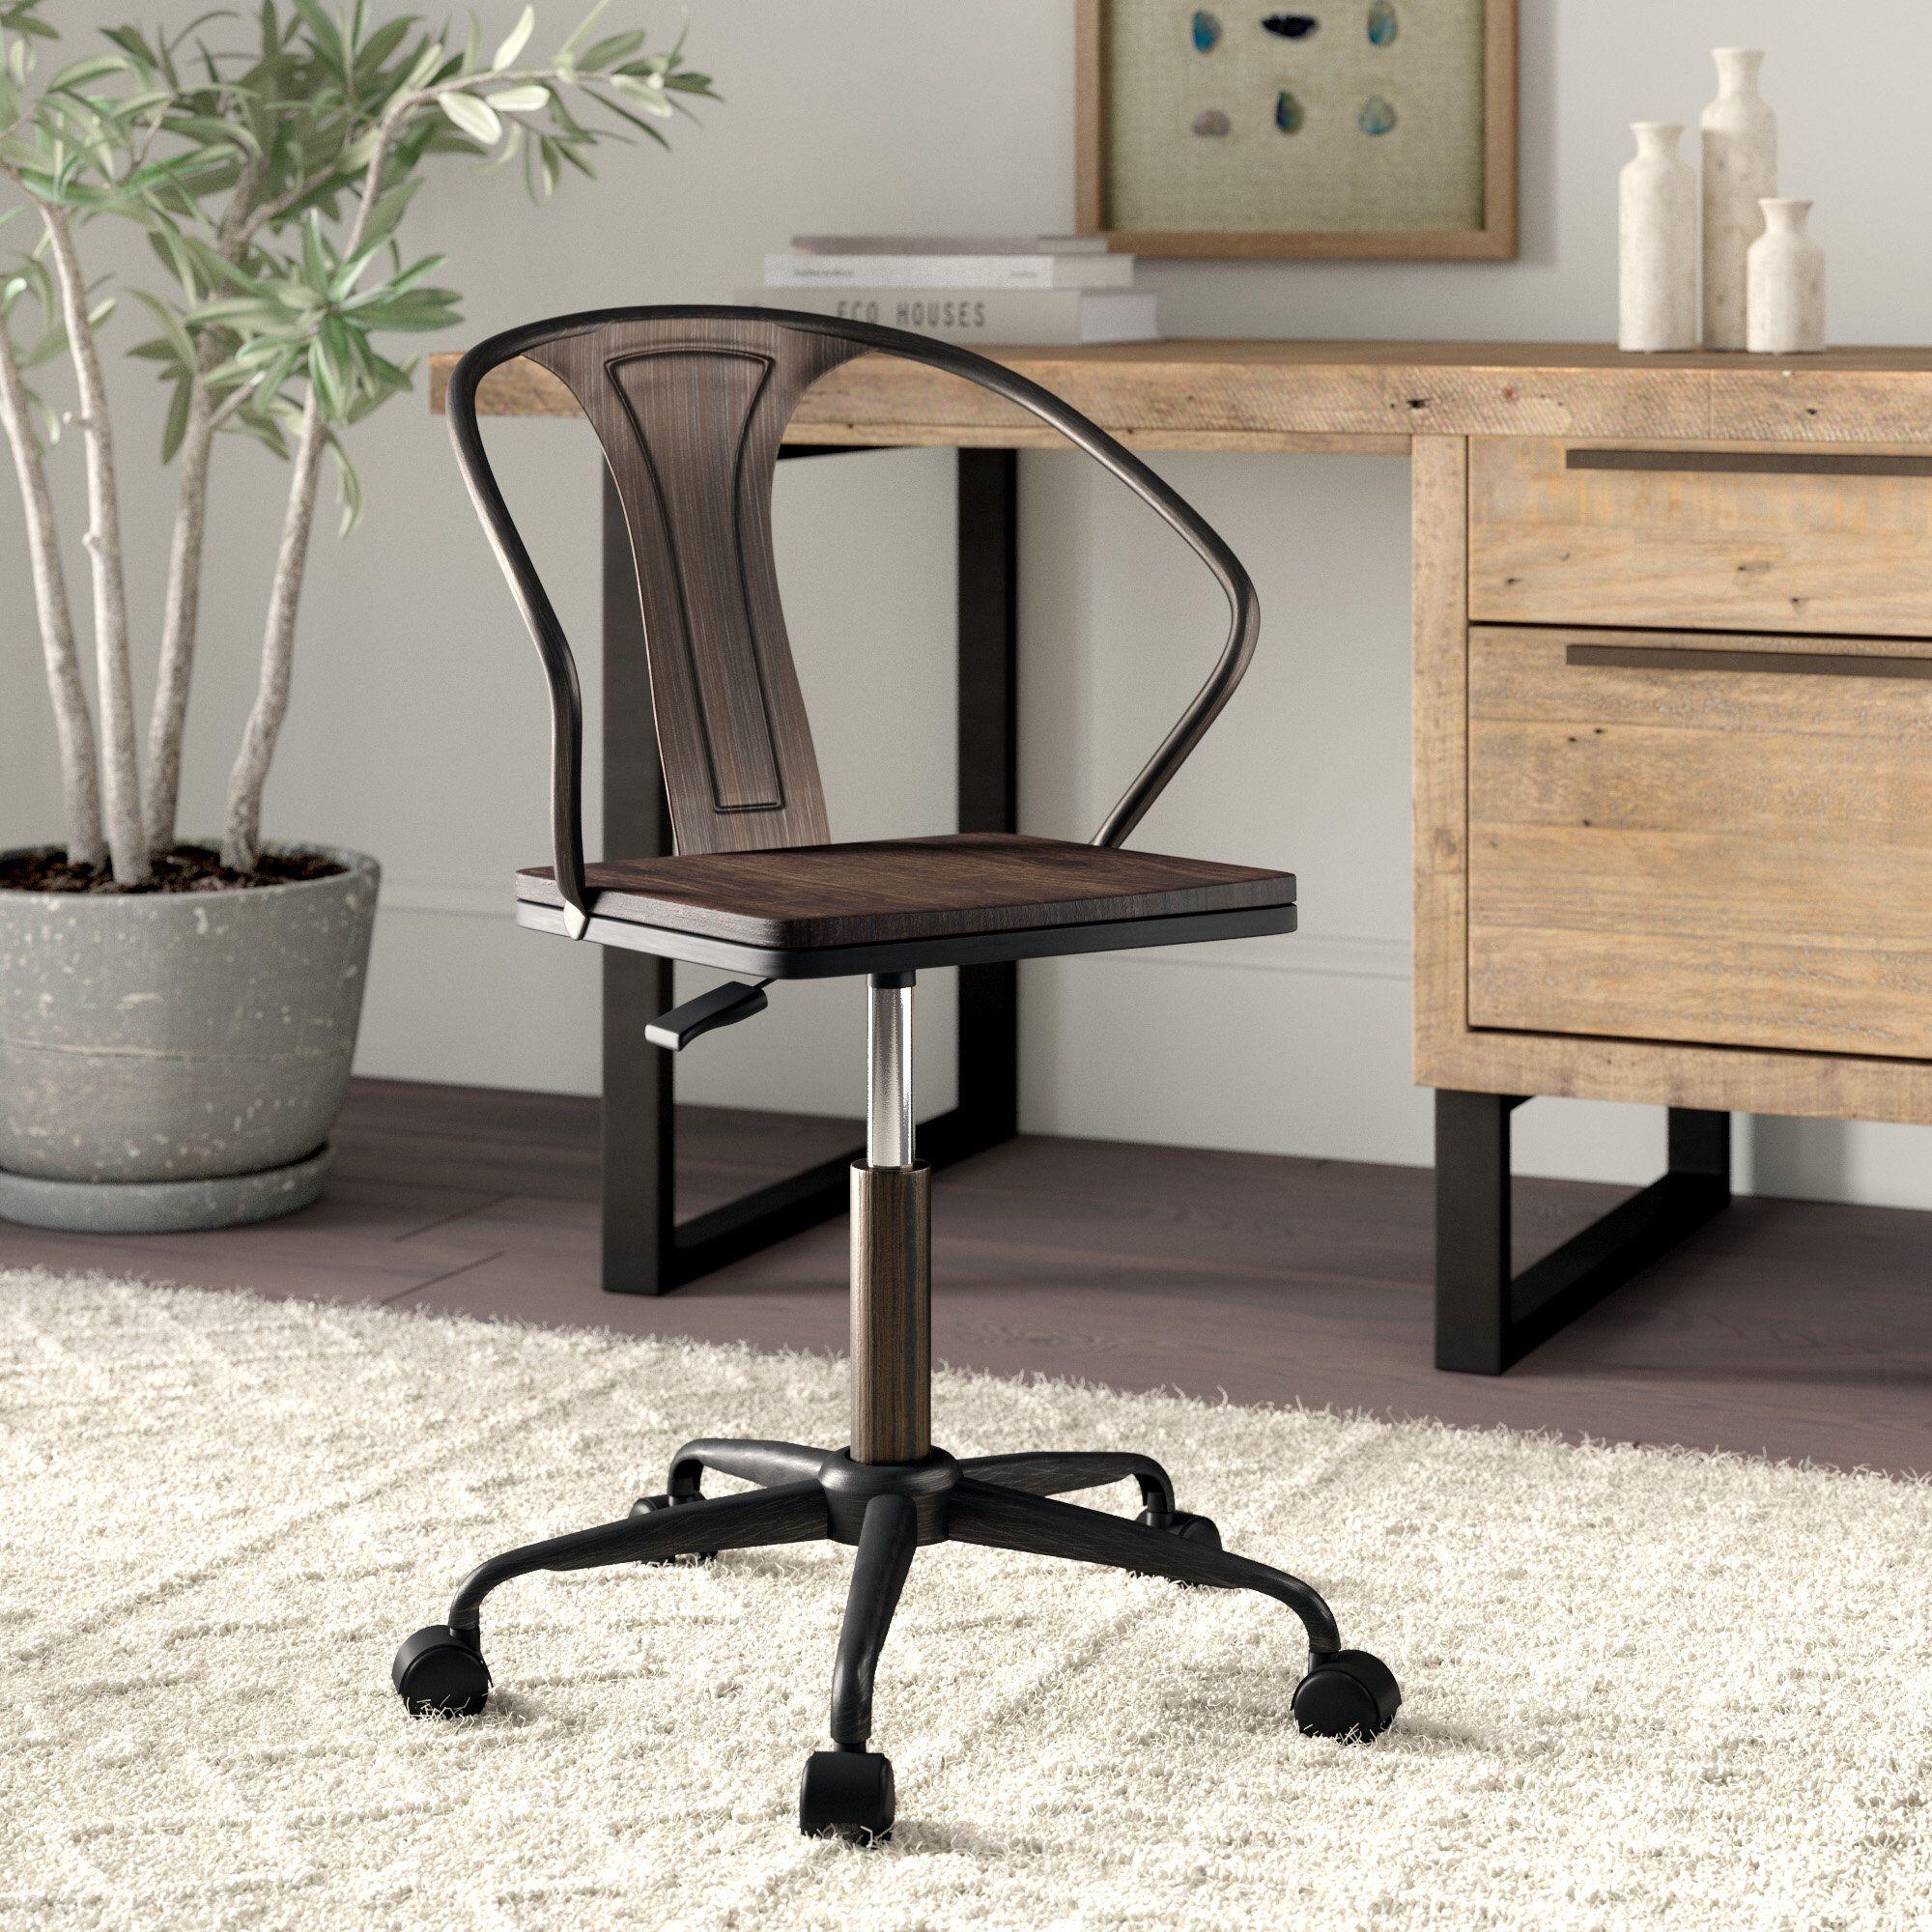 Aledo Industrial Office Chair Chair Furniture Modern Office Chair